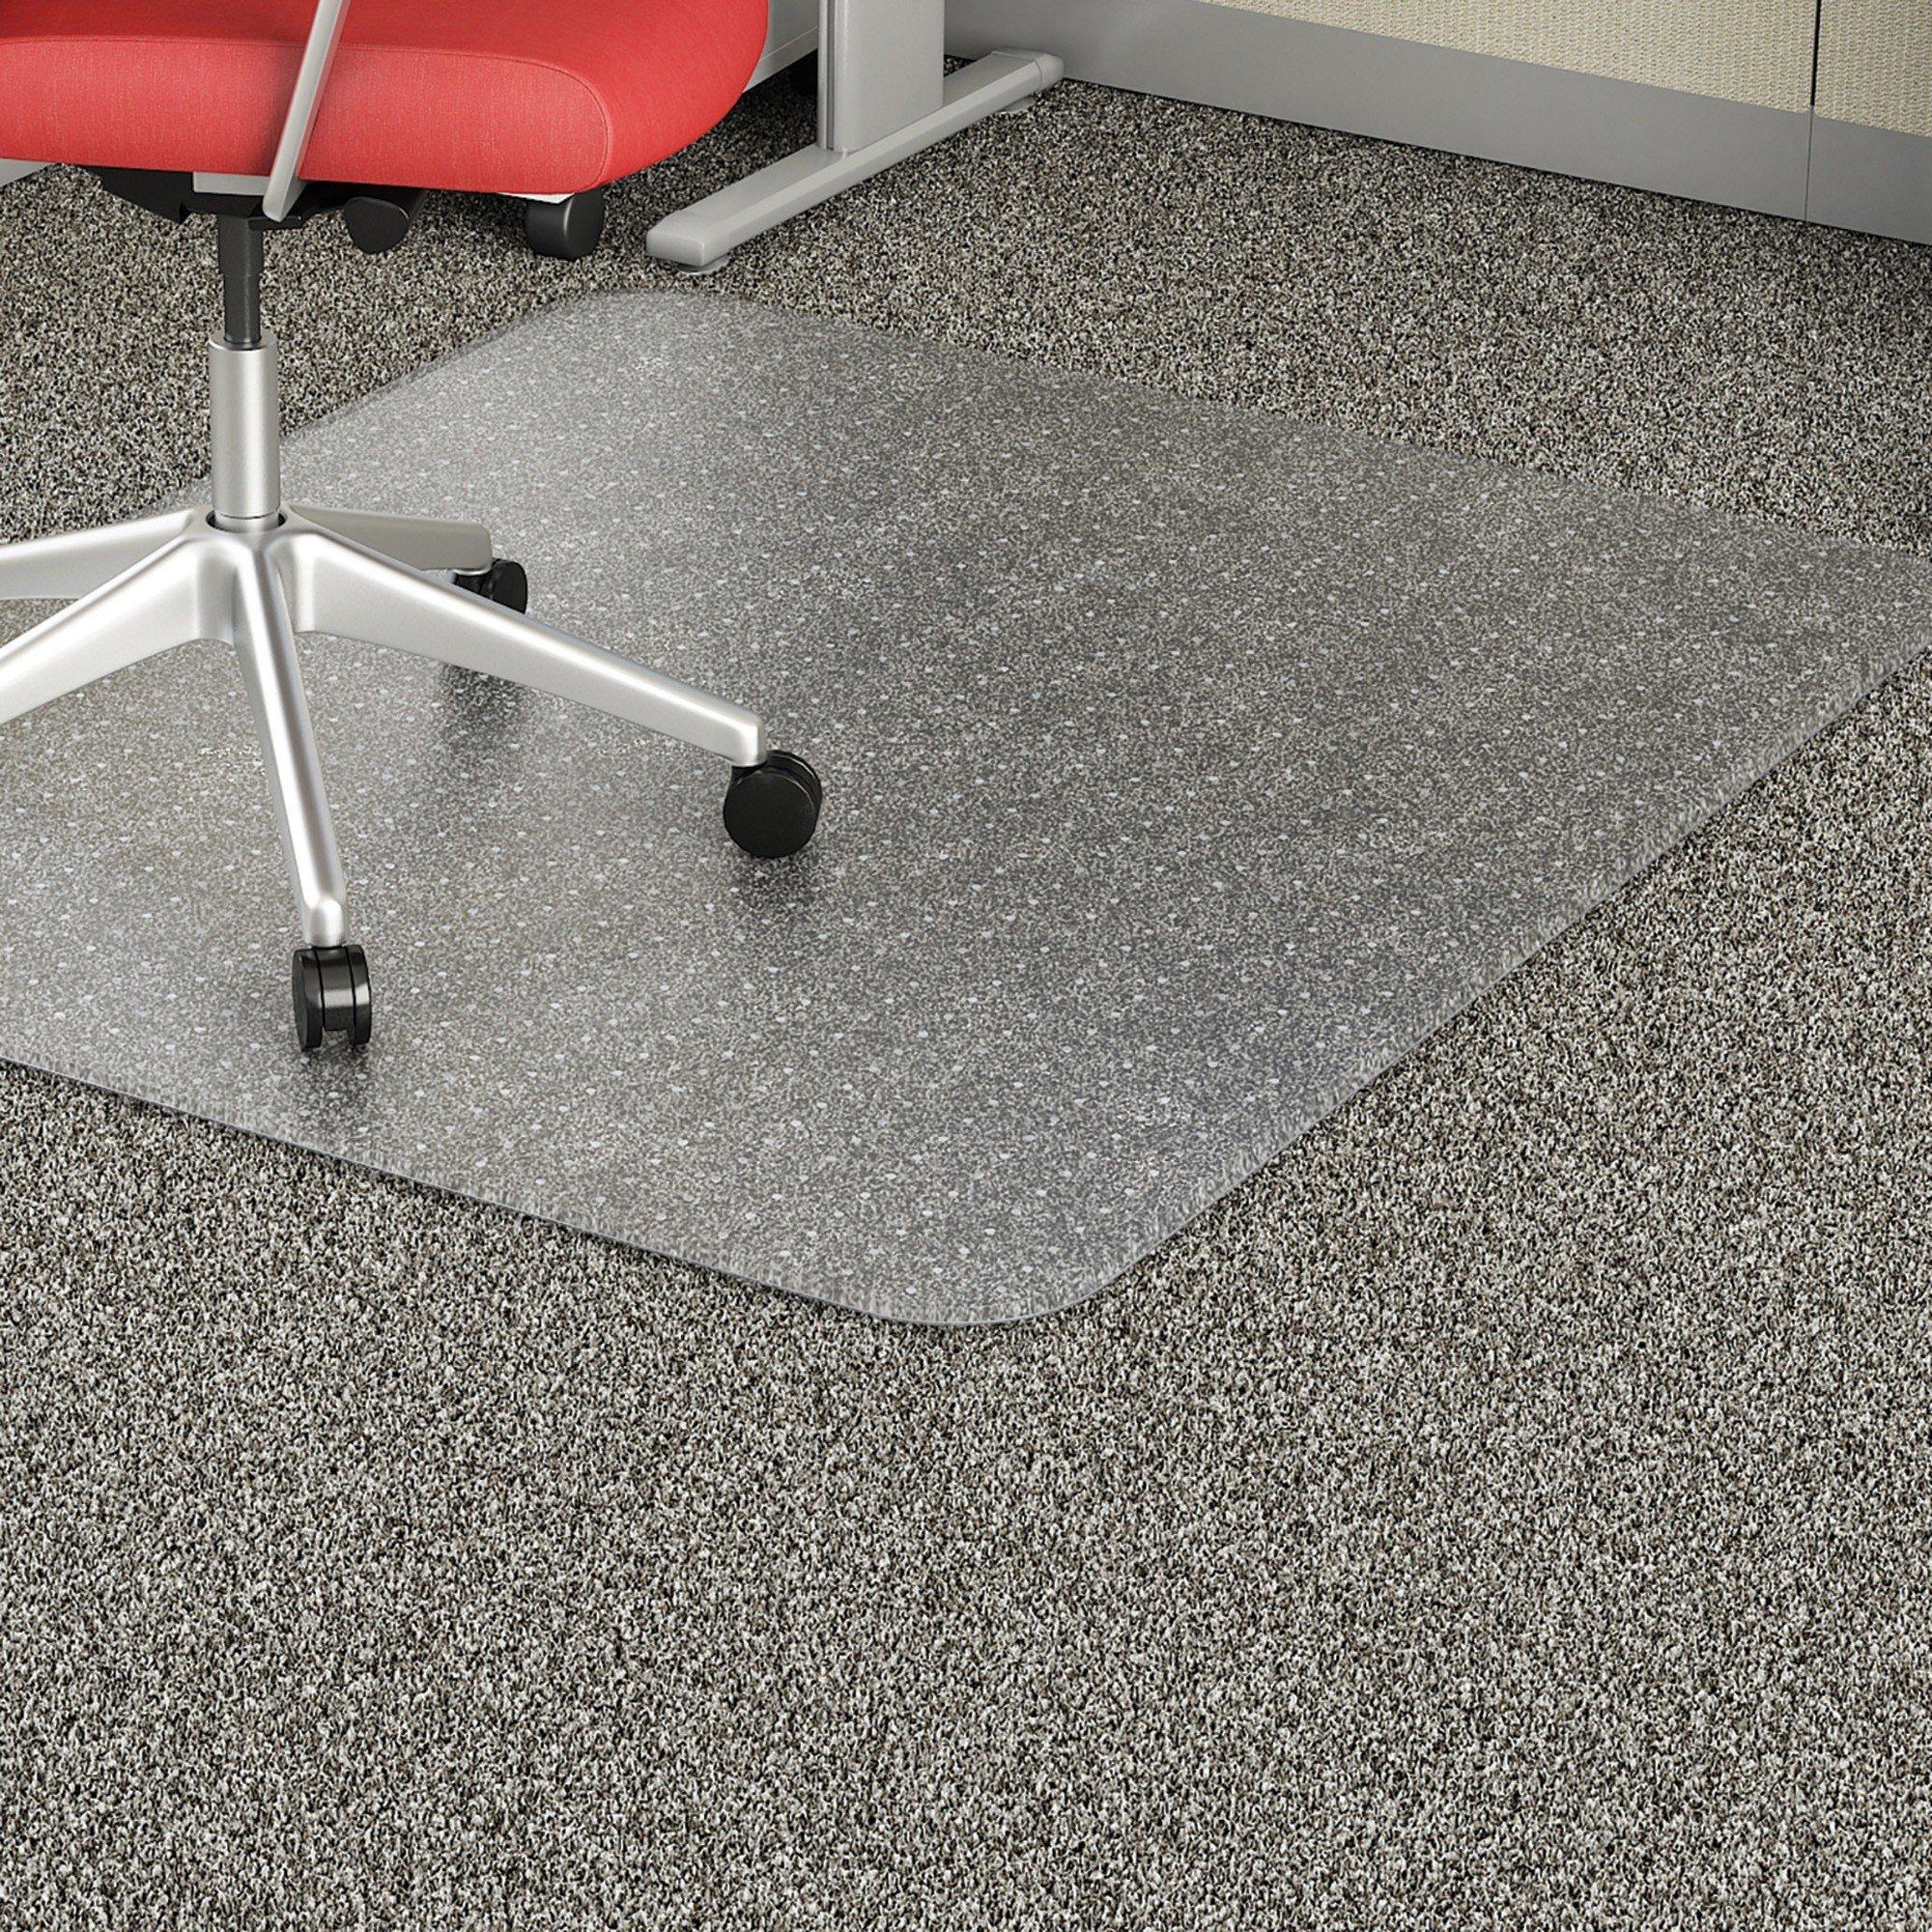 Lorell Rectangular Low-pile Economy Chairmat 60 x 46